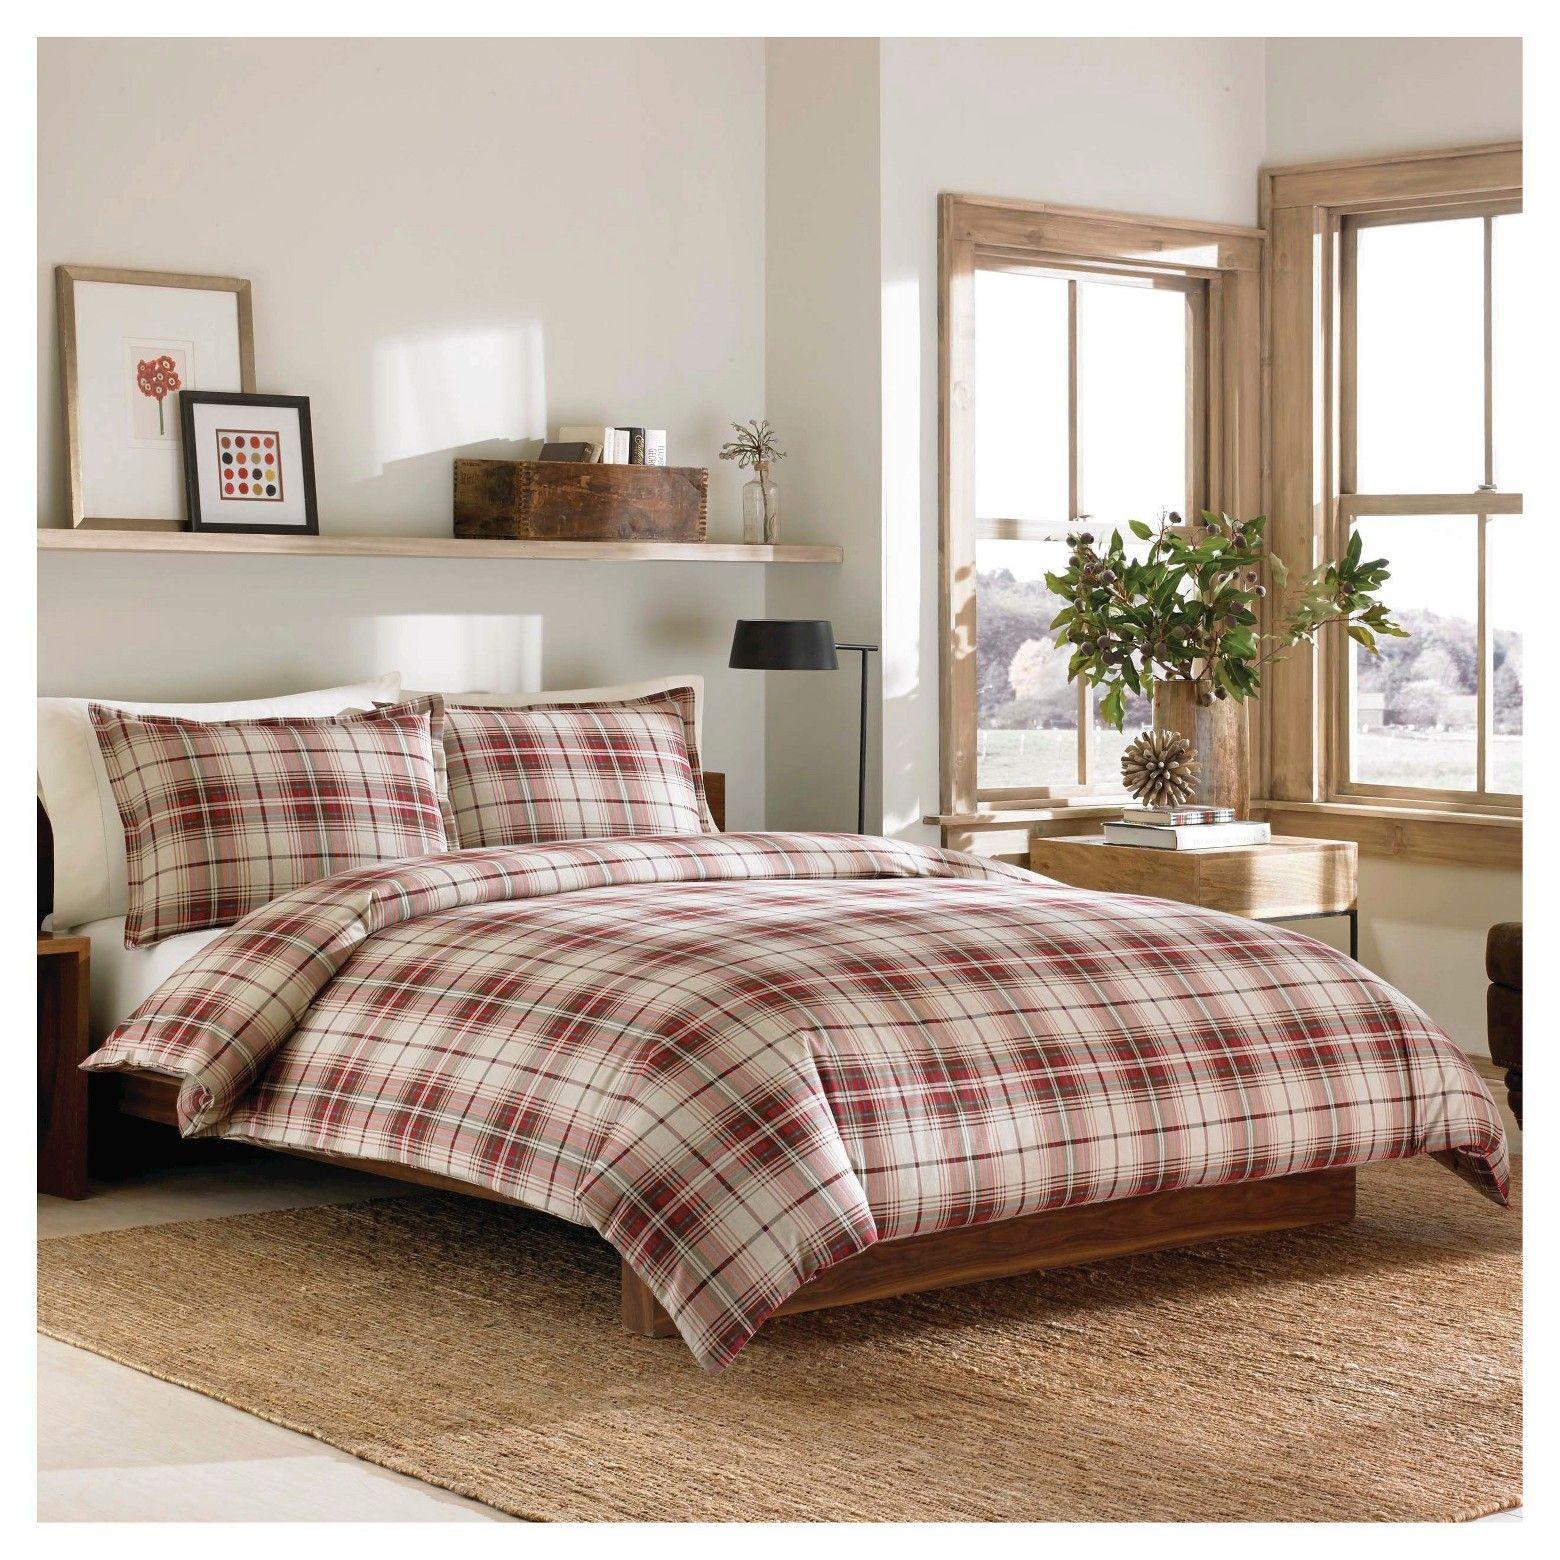 Eddie Bauer Montlake Plaid Flannel Duvet Cover Mini Set Red King Target Duvet Sets Flannel Duvet Cover Plaid Comforter